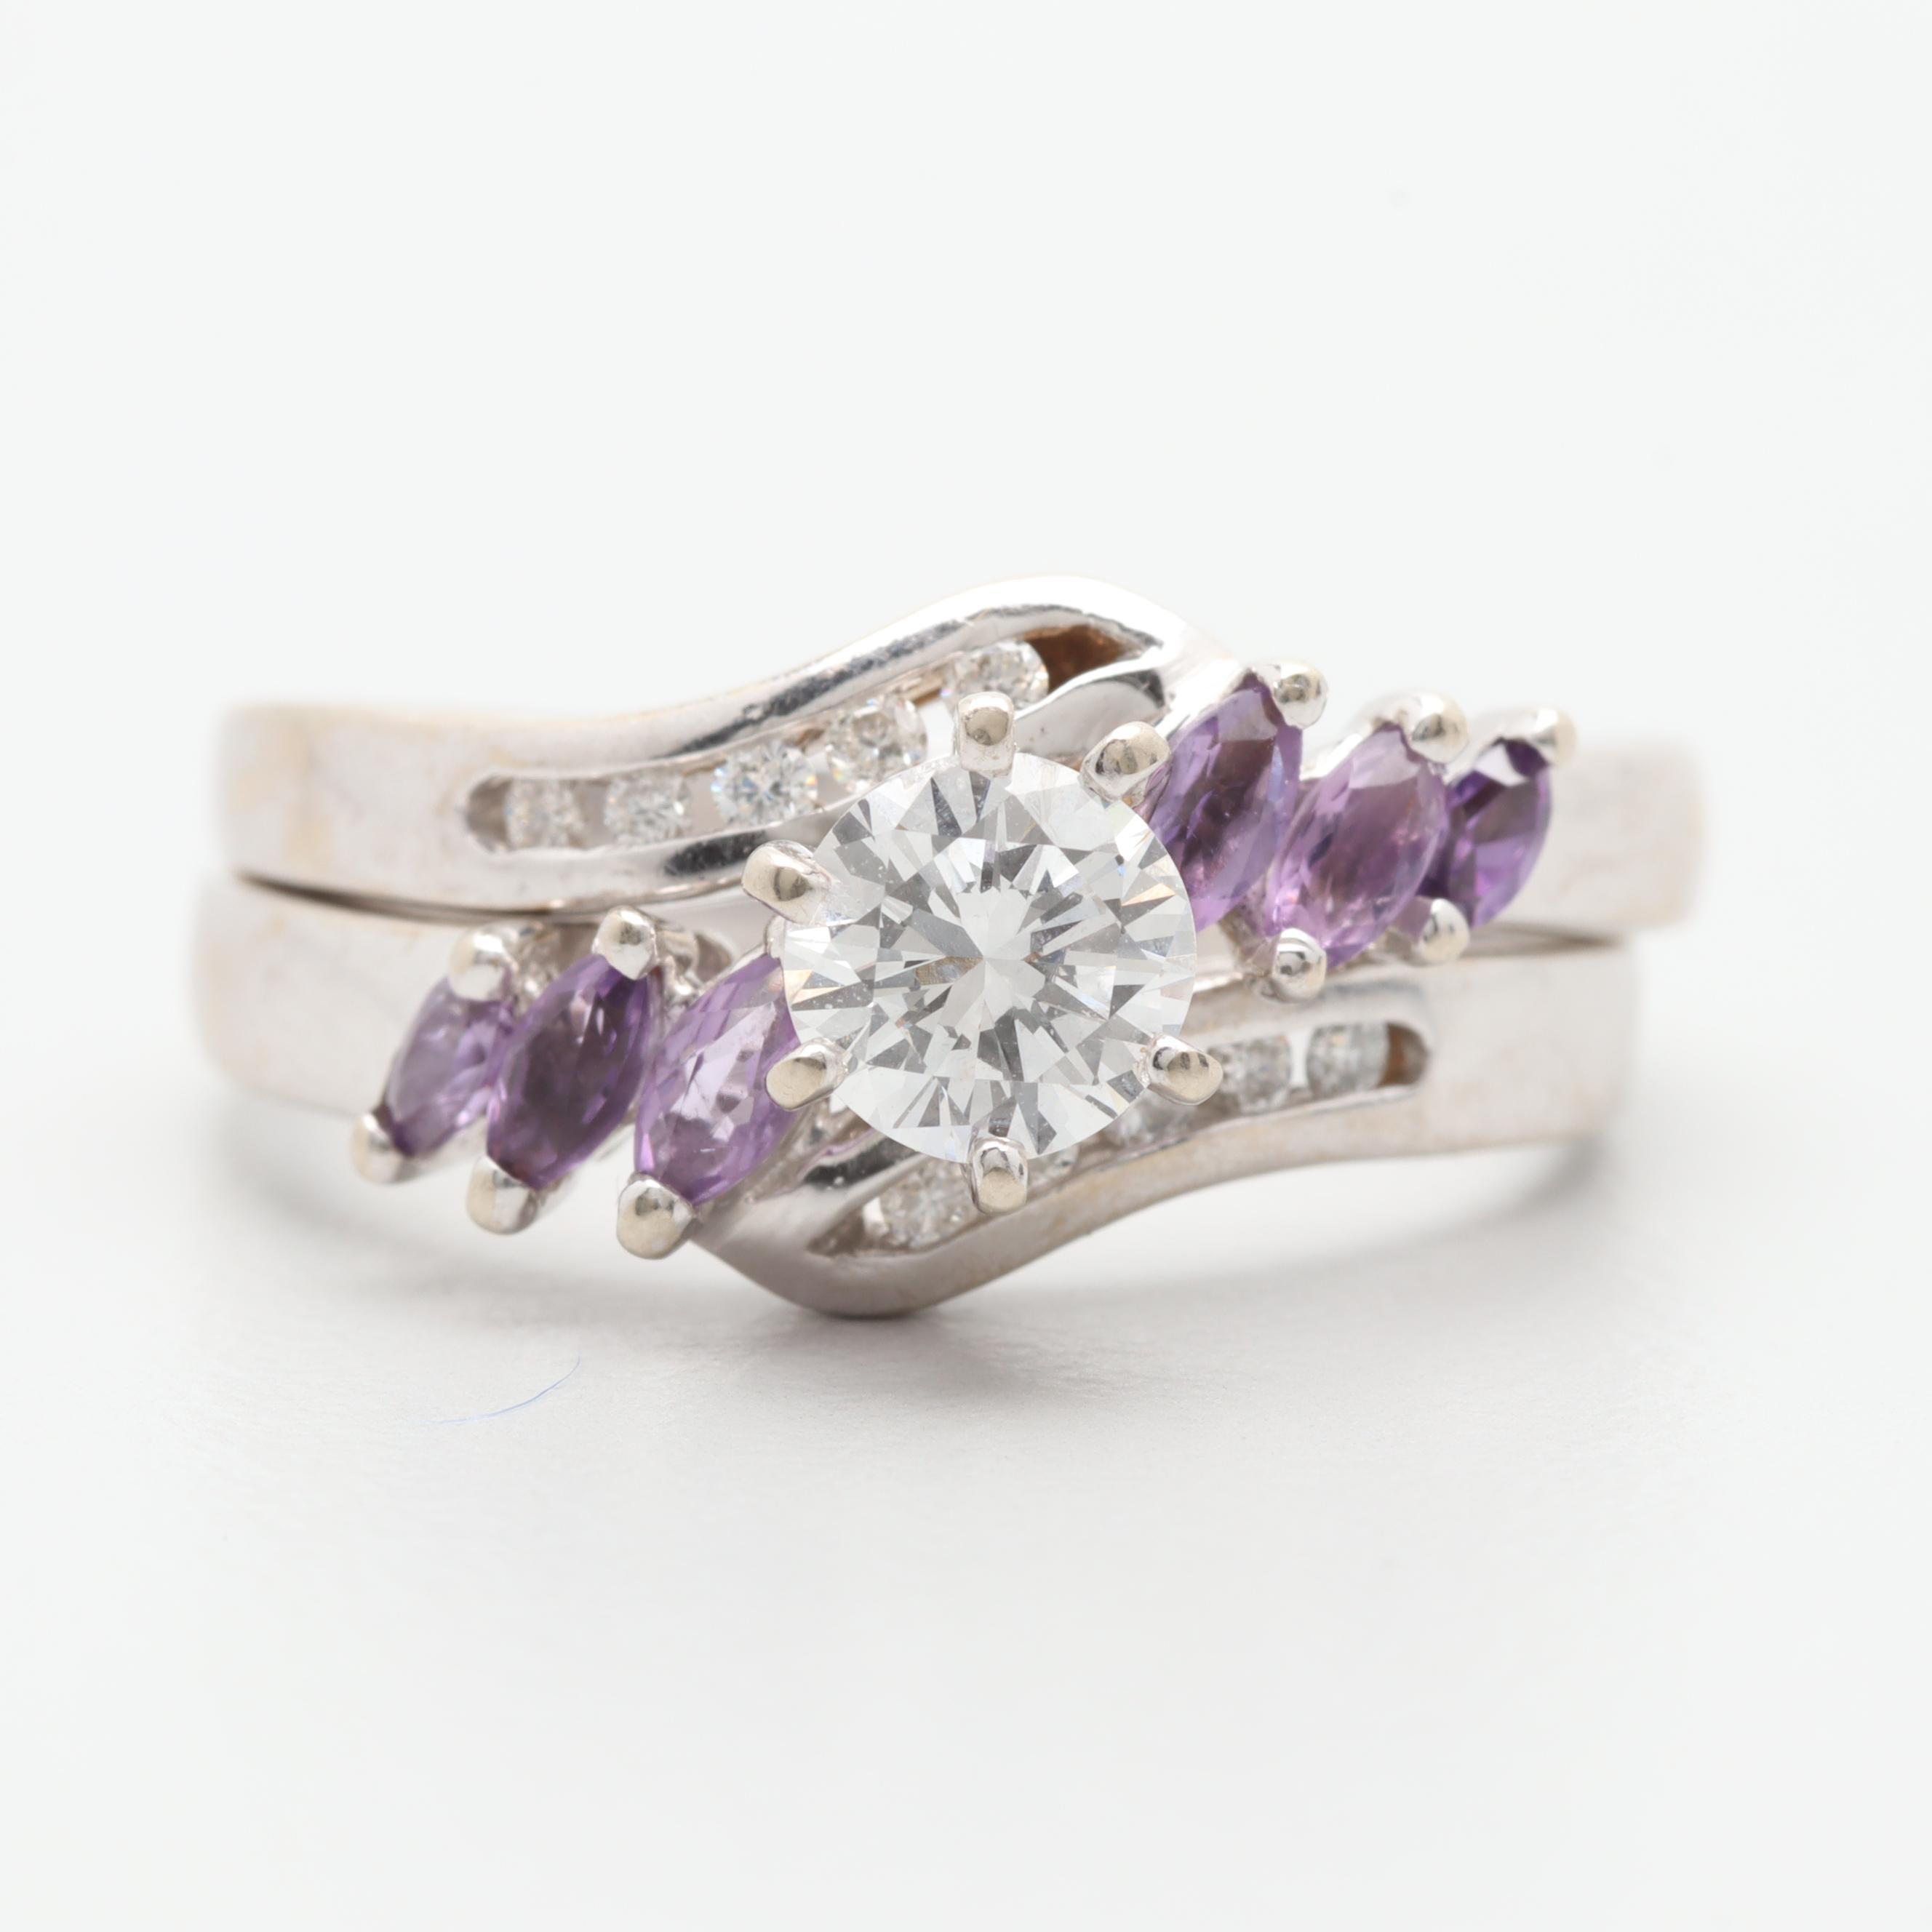 14K White Gold Diamond and Amethyst Ring Set